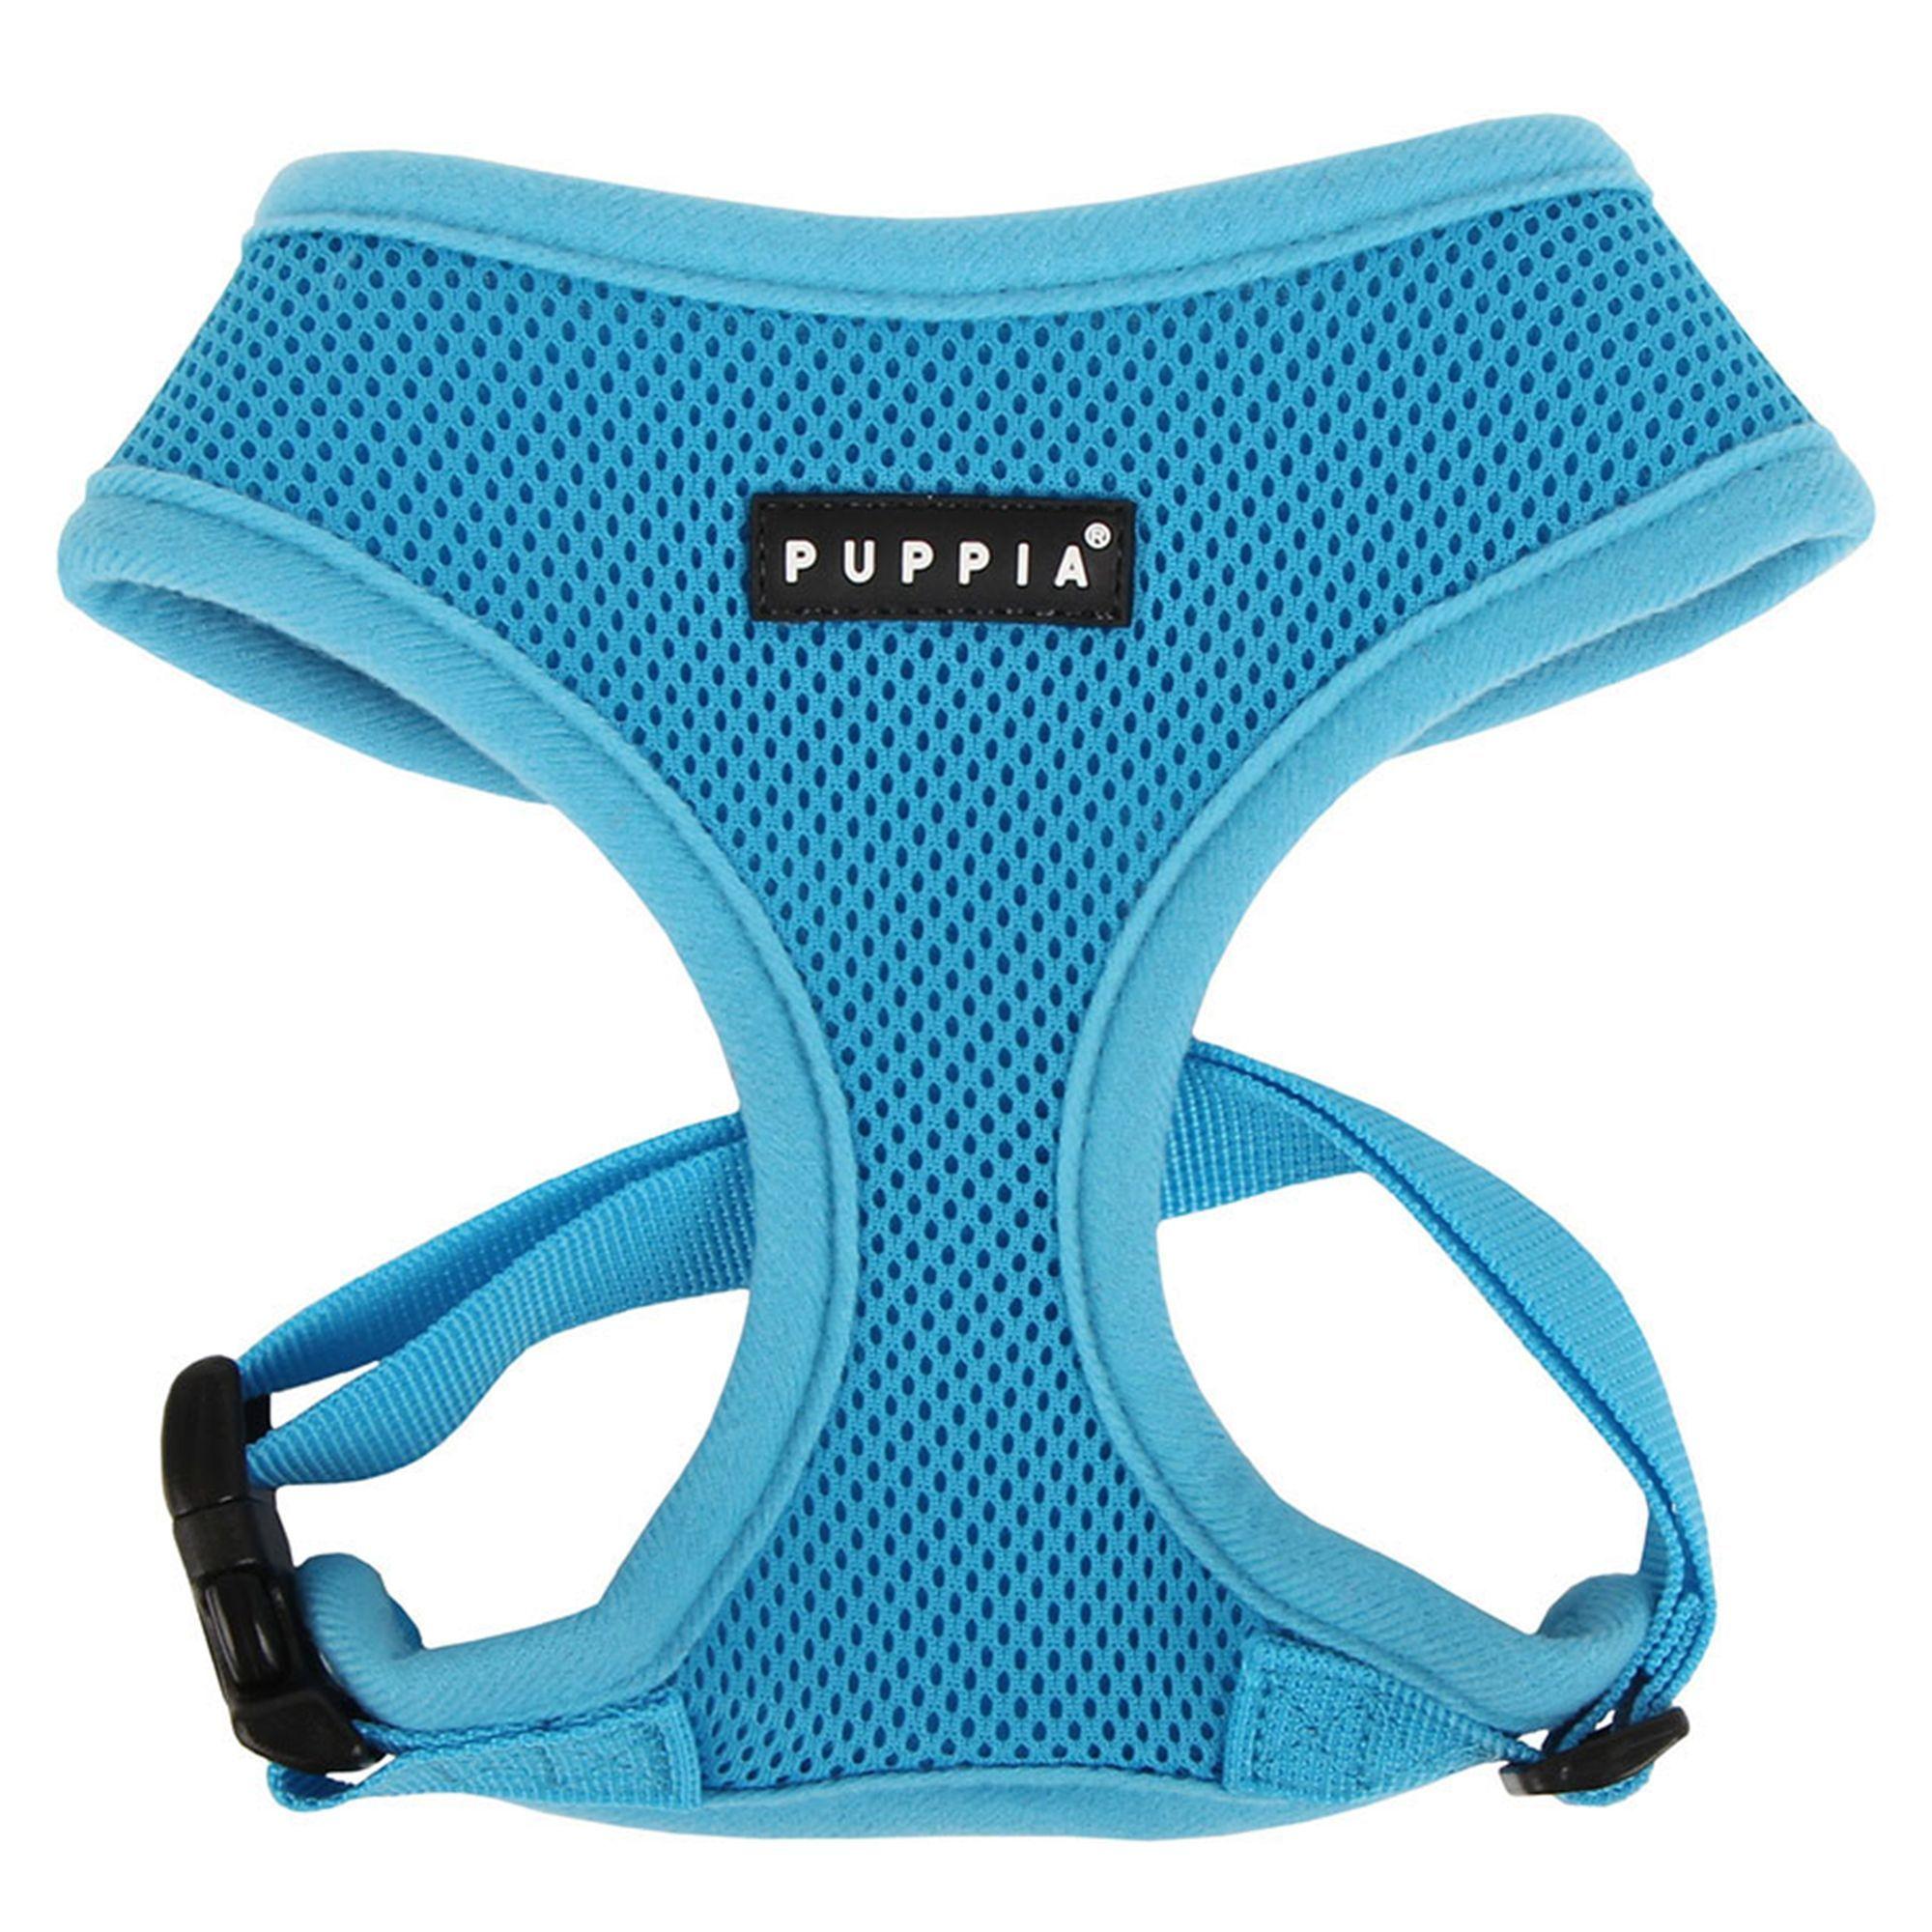 Puppia Soft Adjustable Dog Harness size X Small, Sky Blue